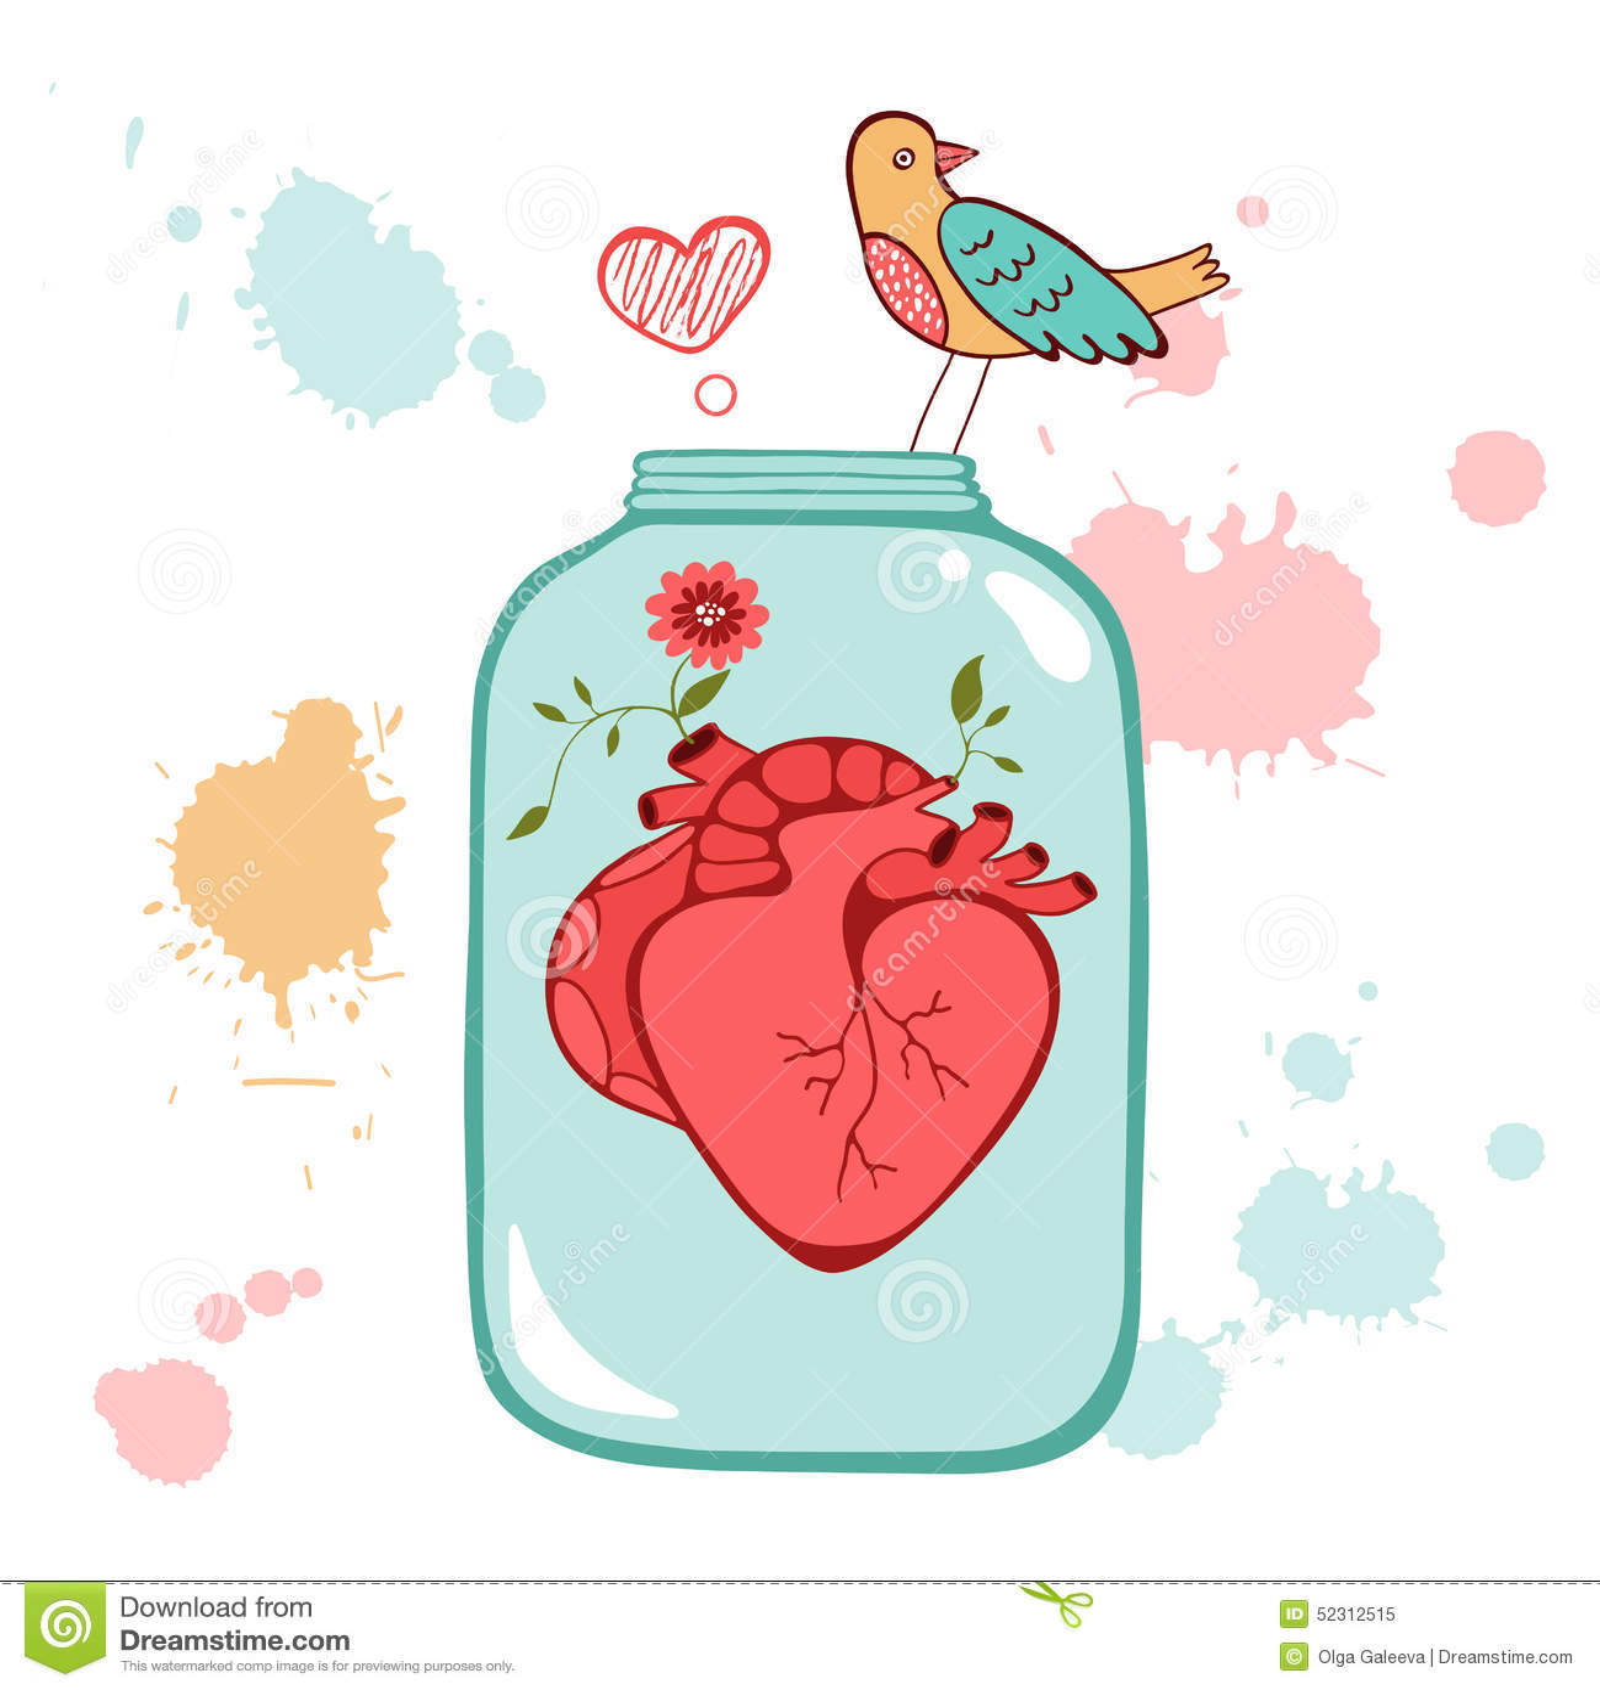 Concept love card stock vector. Illustration of bird - 52312515